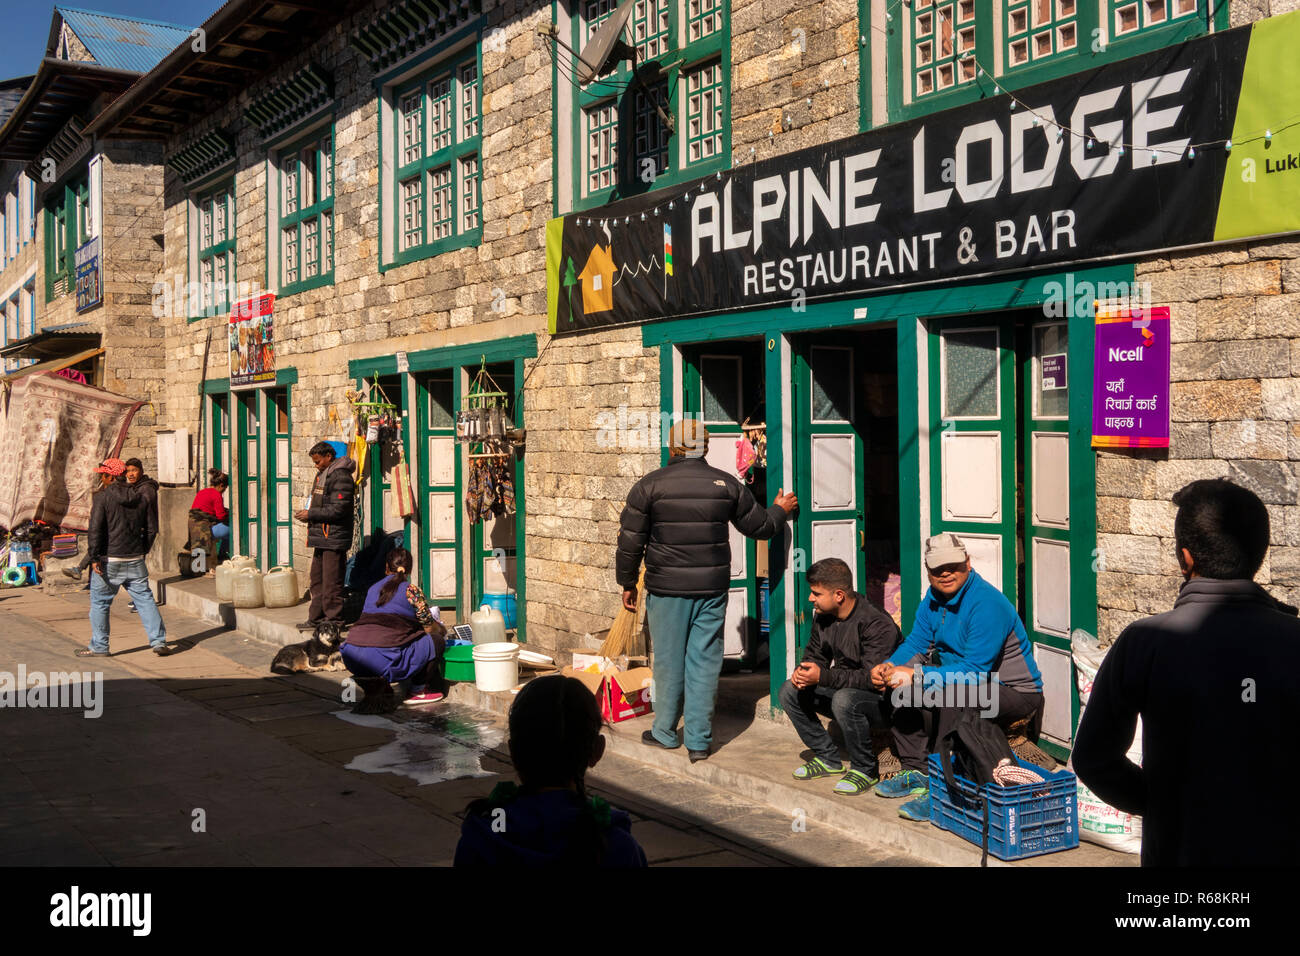 Nepal, Lukla, main street, people in sunshine outside Alpine Lodge restaurant and bar - Stock Image